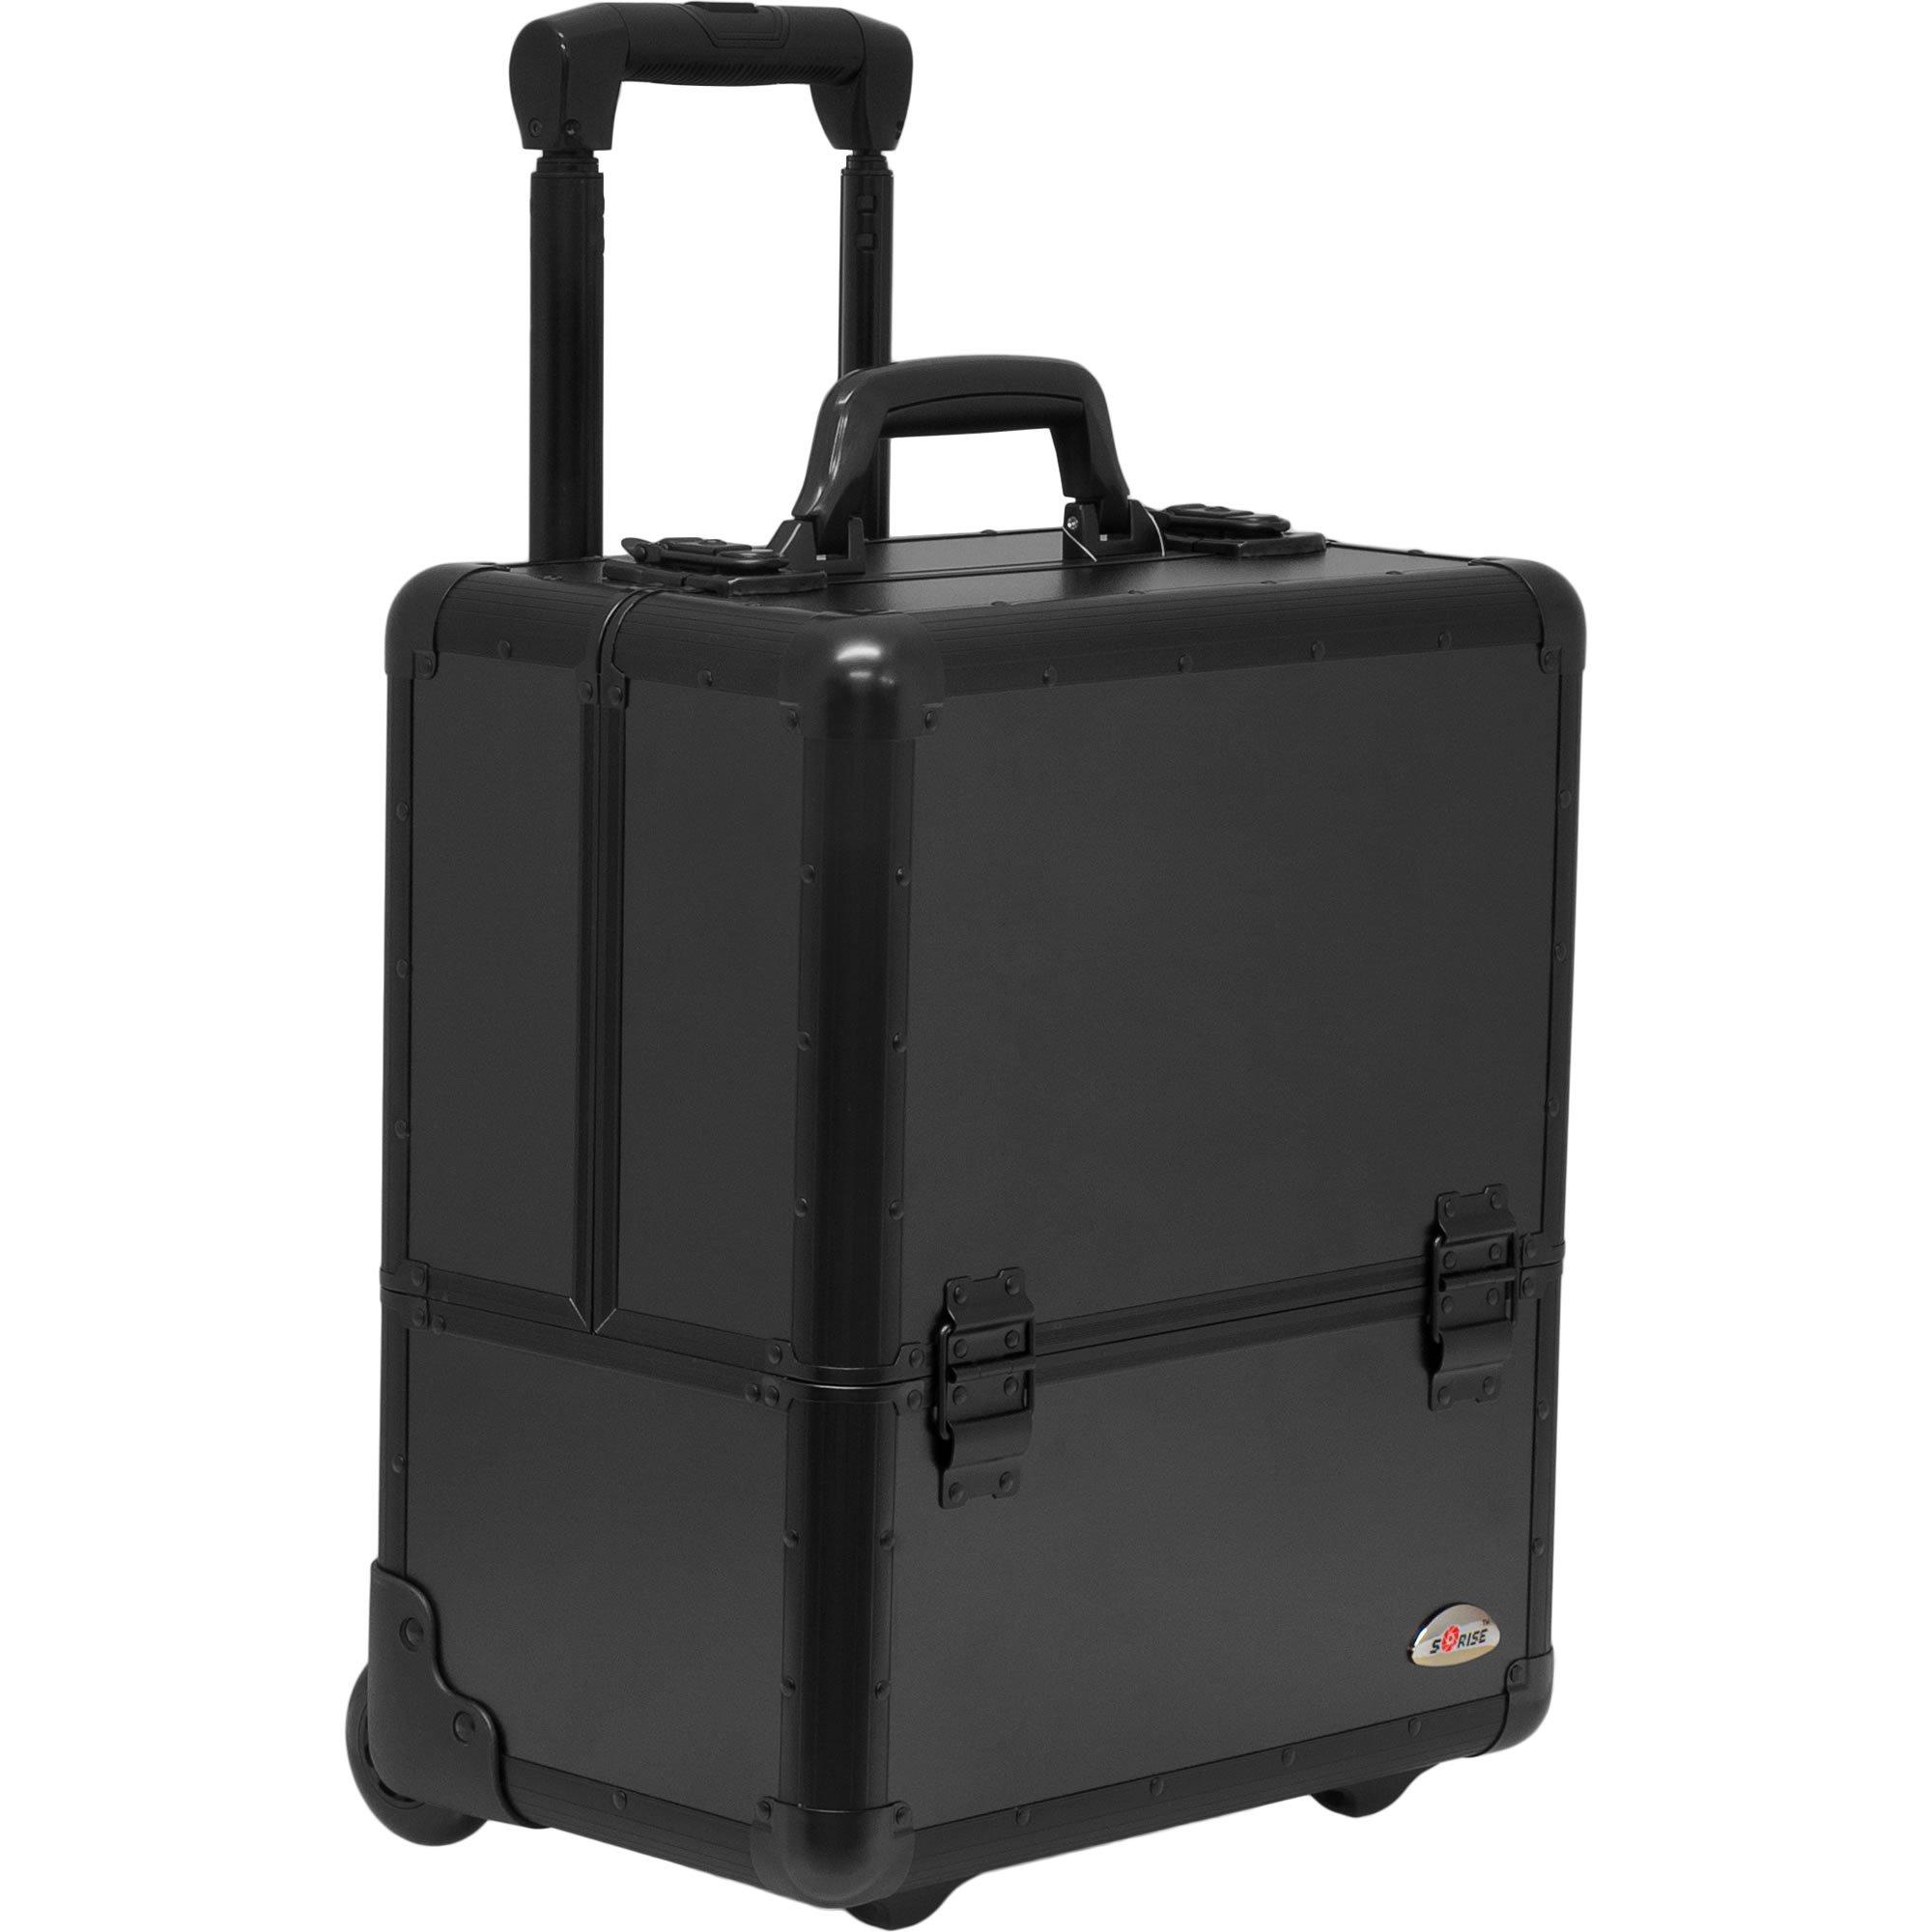 SUNRISE Makeup Case on Wheels C6033 Artis Professional Storage, 8 Trays with Adjustable Dividers, Black Matte by SunRise